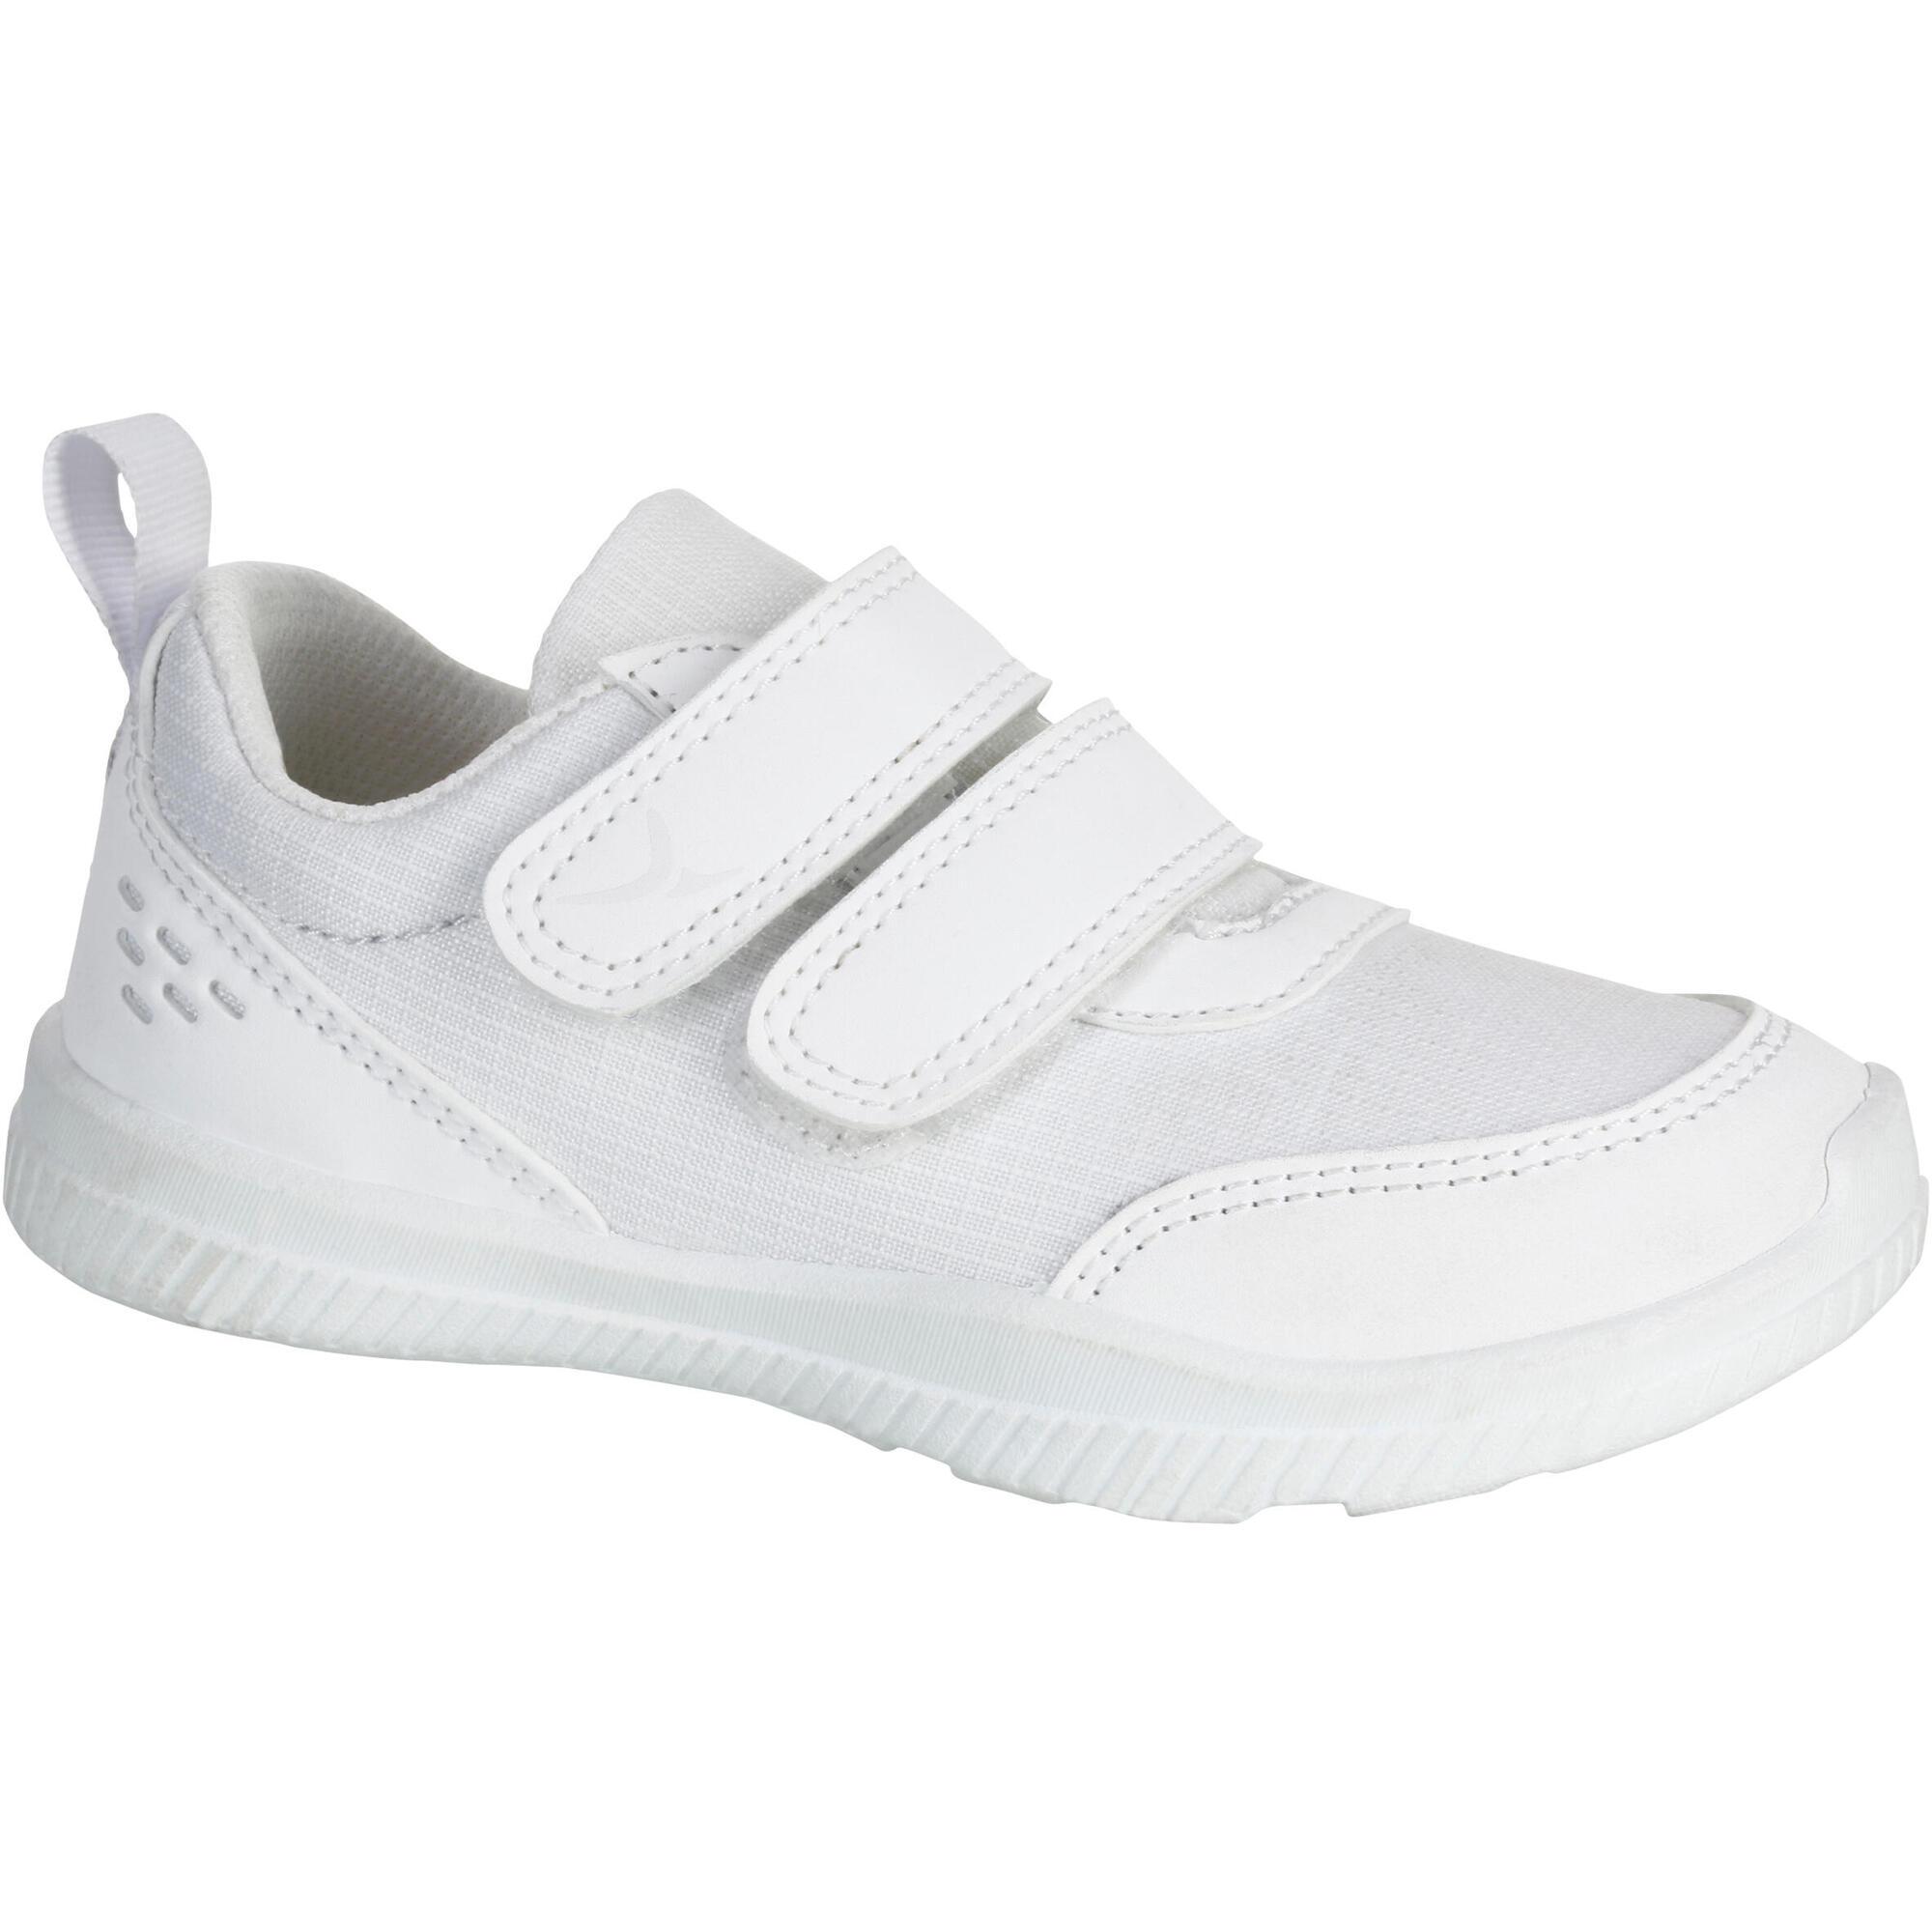 white sneakers gym